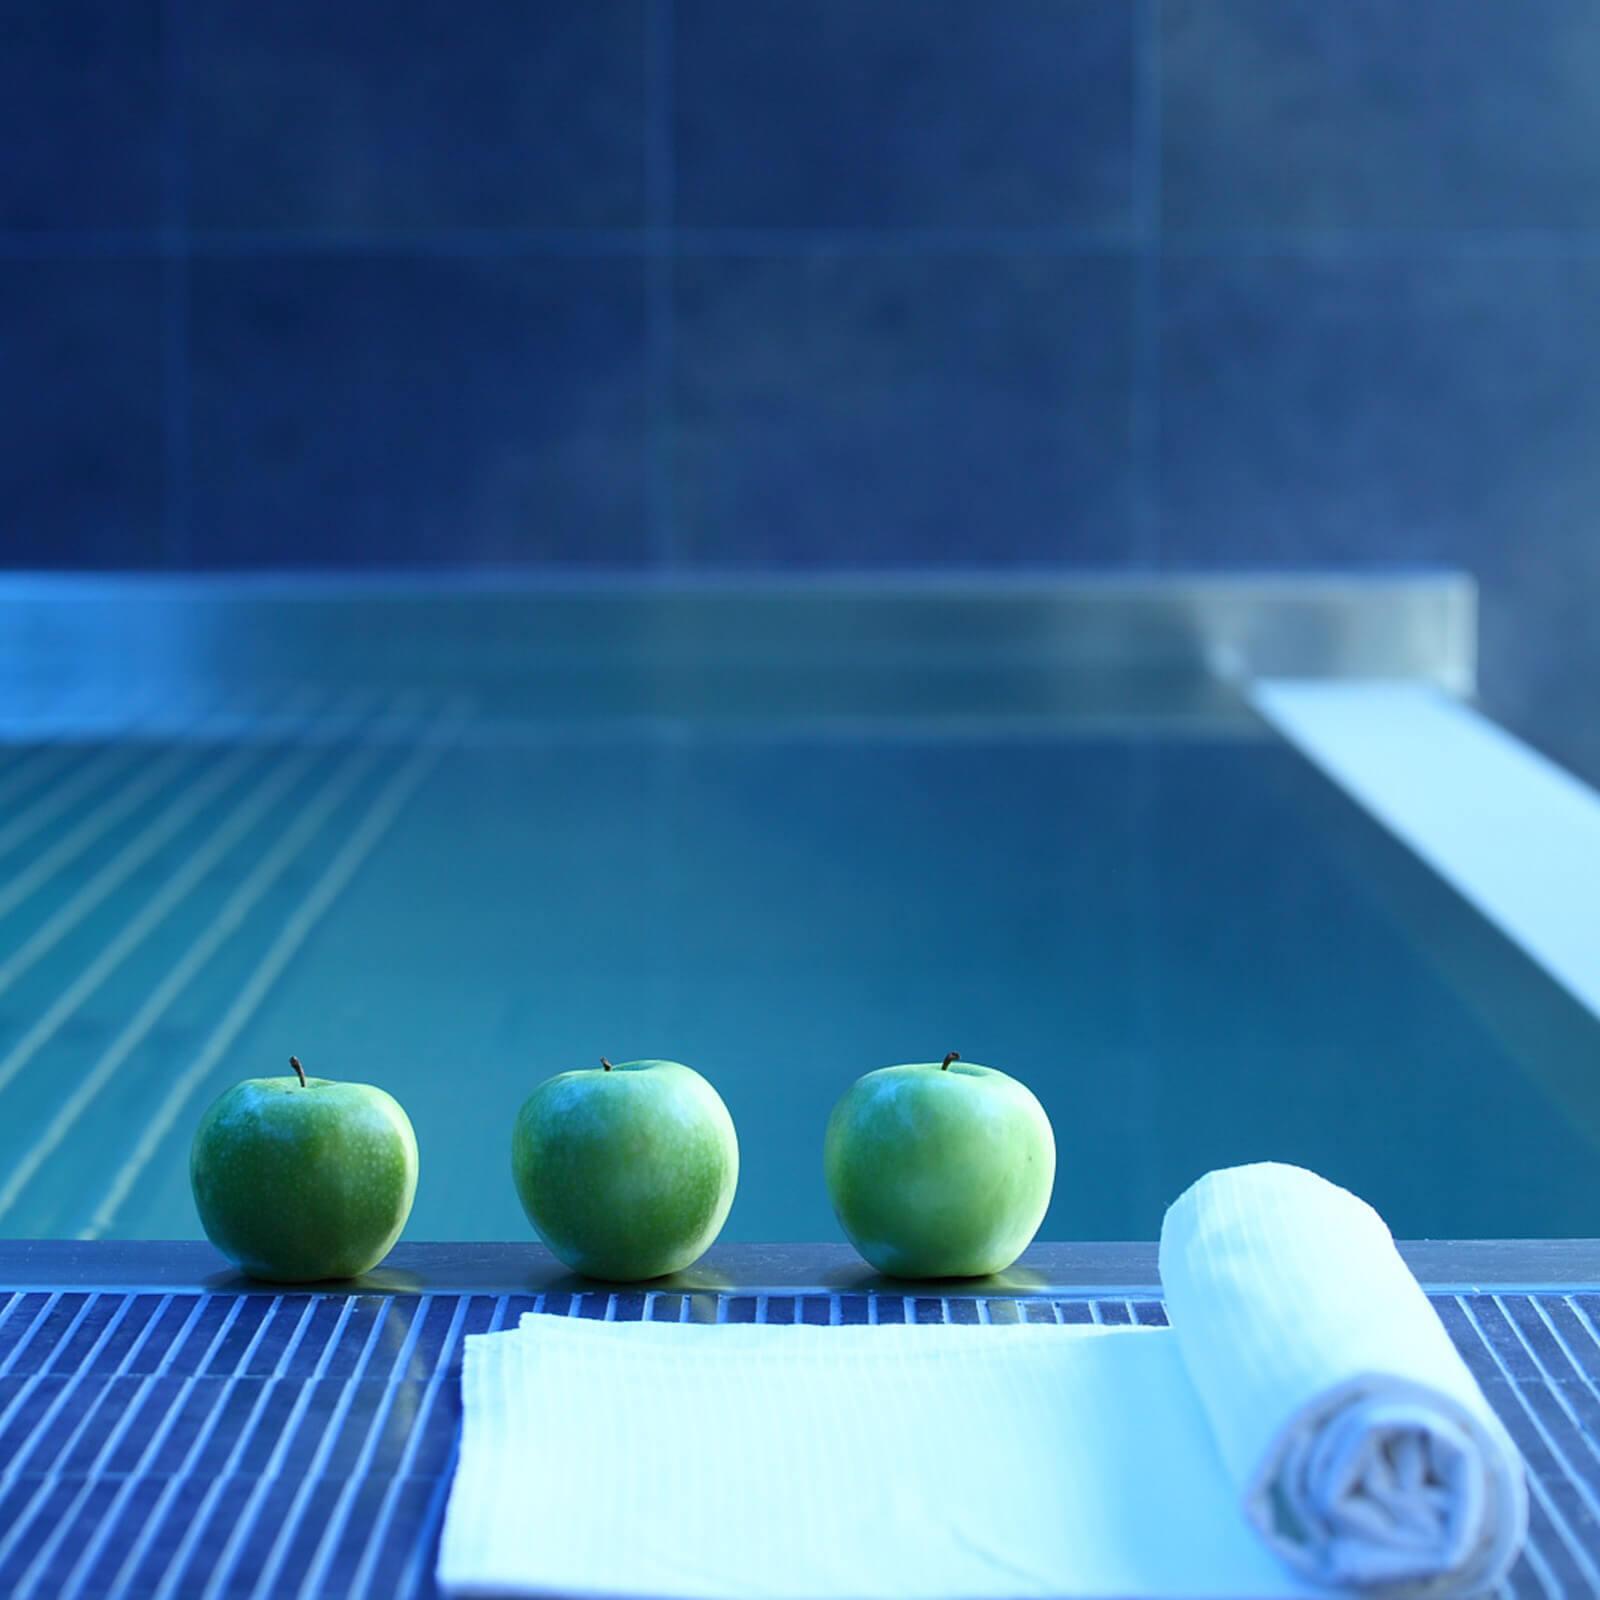 blu-moret-wellness-spa-centro-benessere-udine-dettagli-spa4